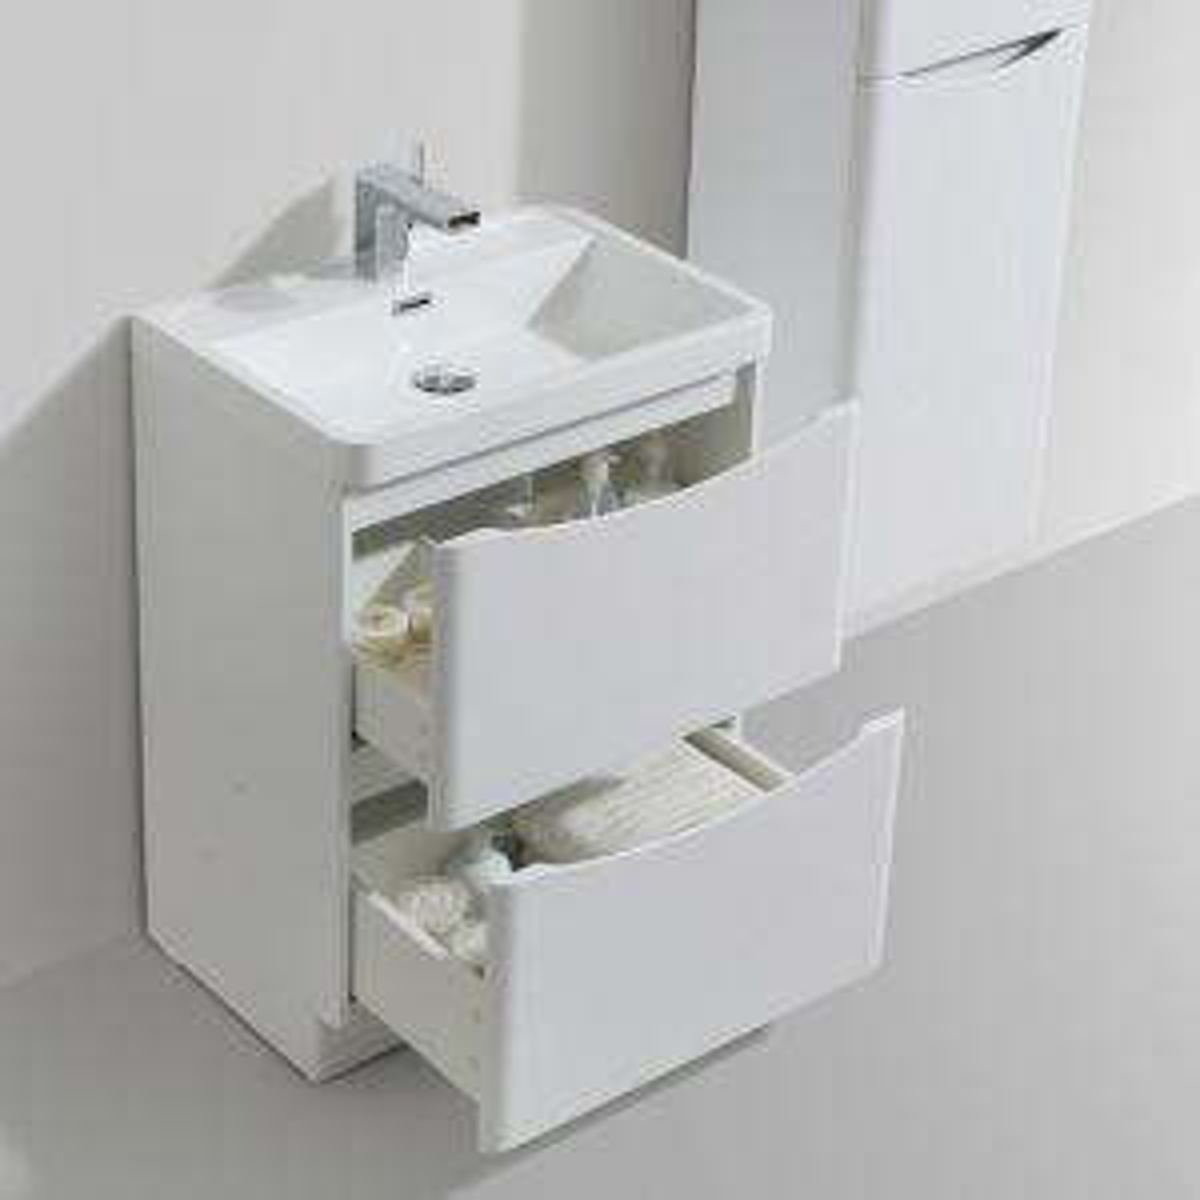 Bali Gloss White Floor Standing Vanity Unit 600mm Lifestyle